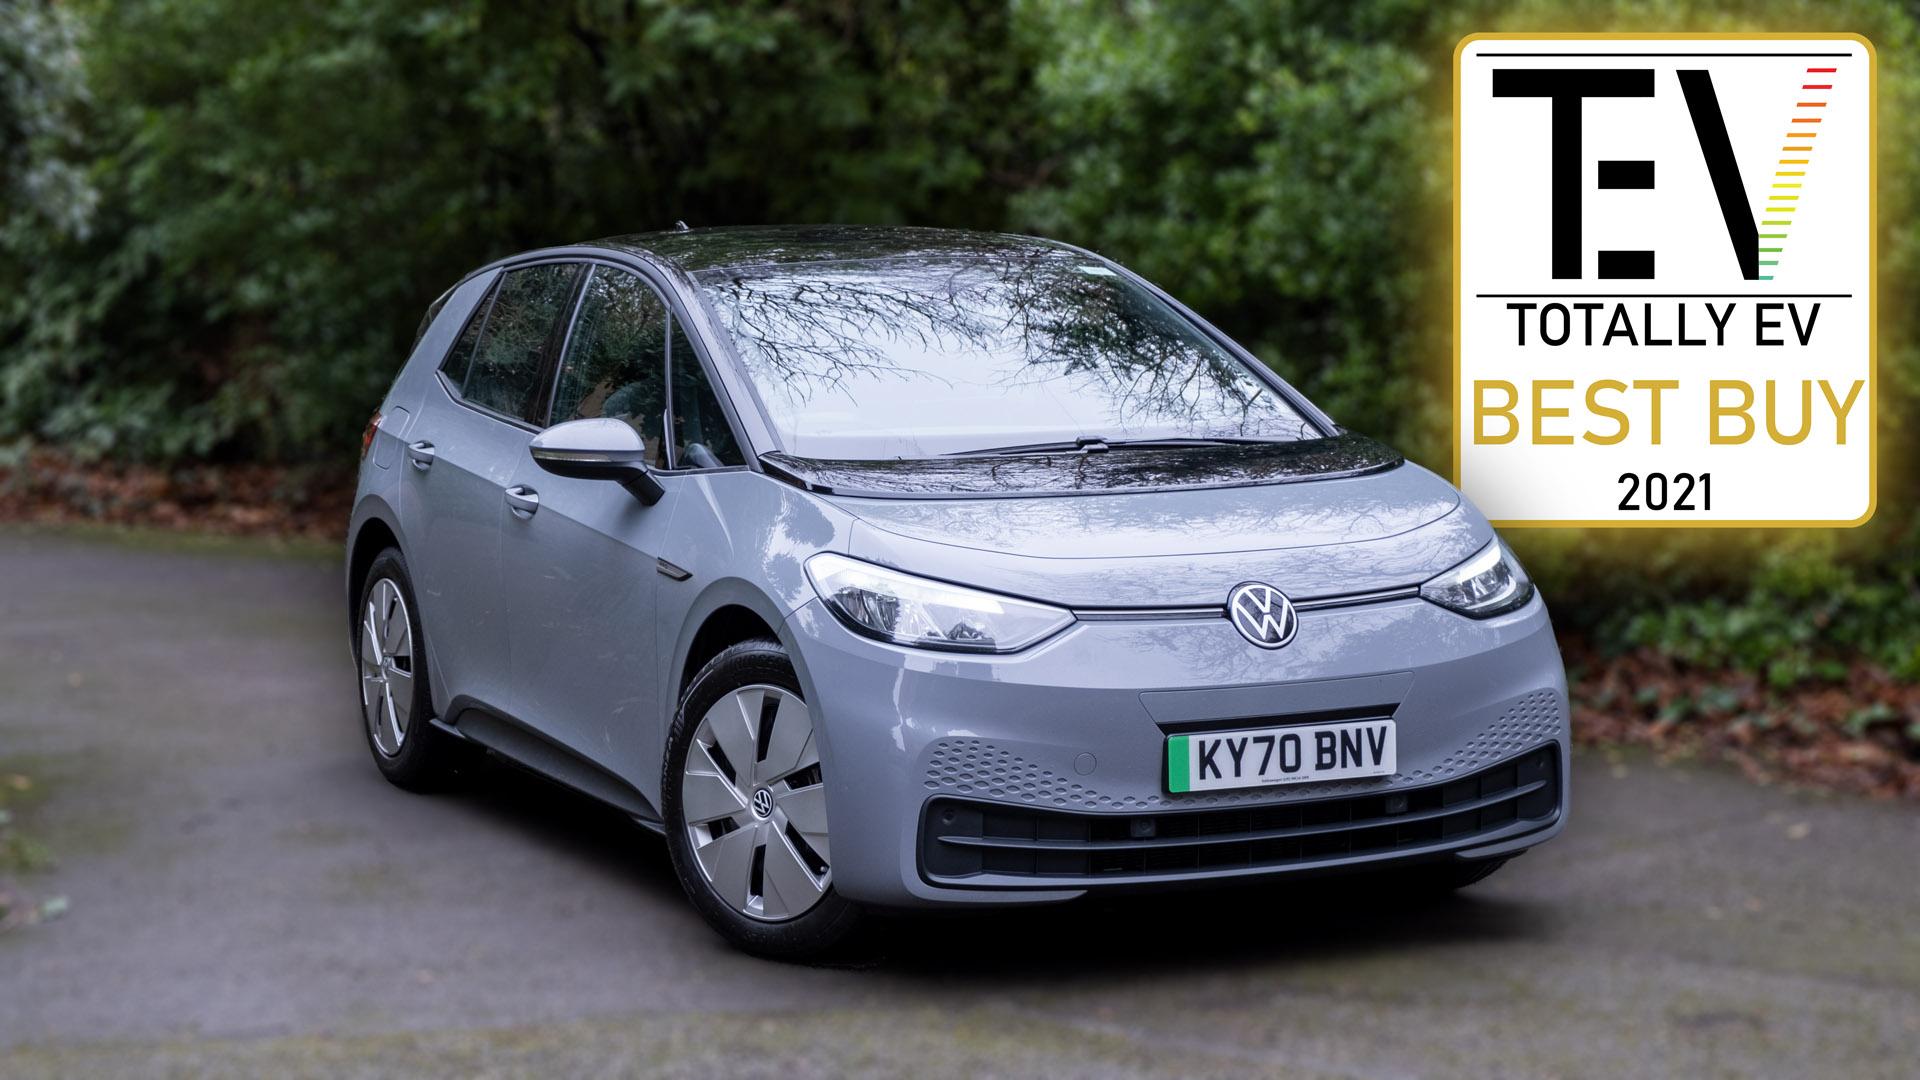 Volkswagen ID.3 review TotallyEV award